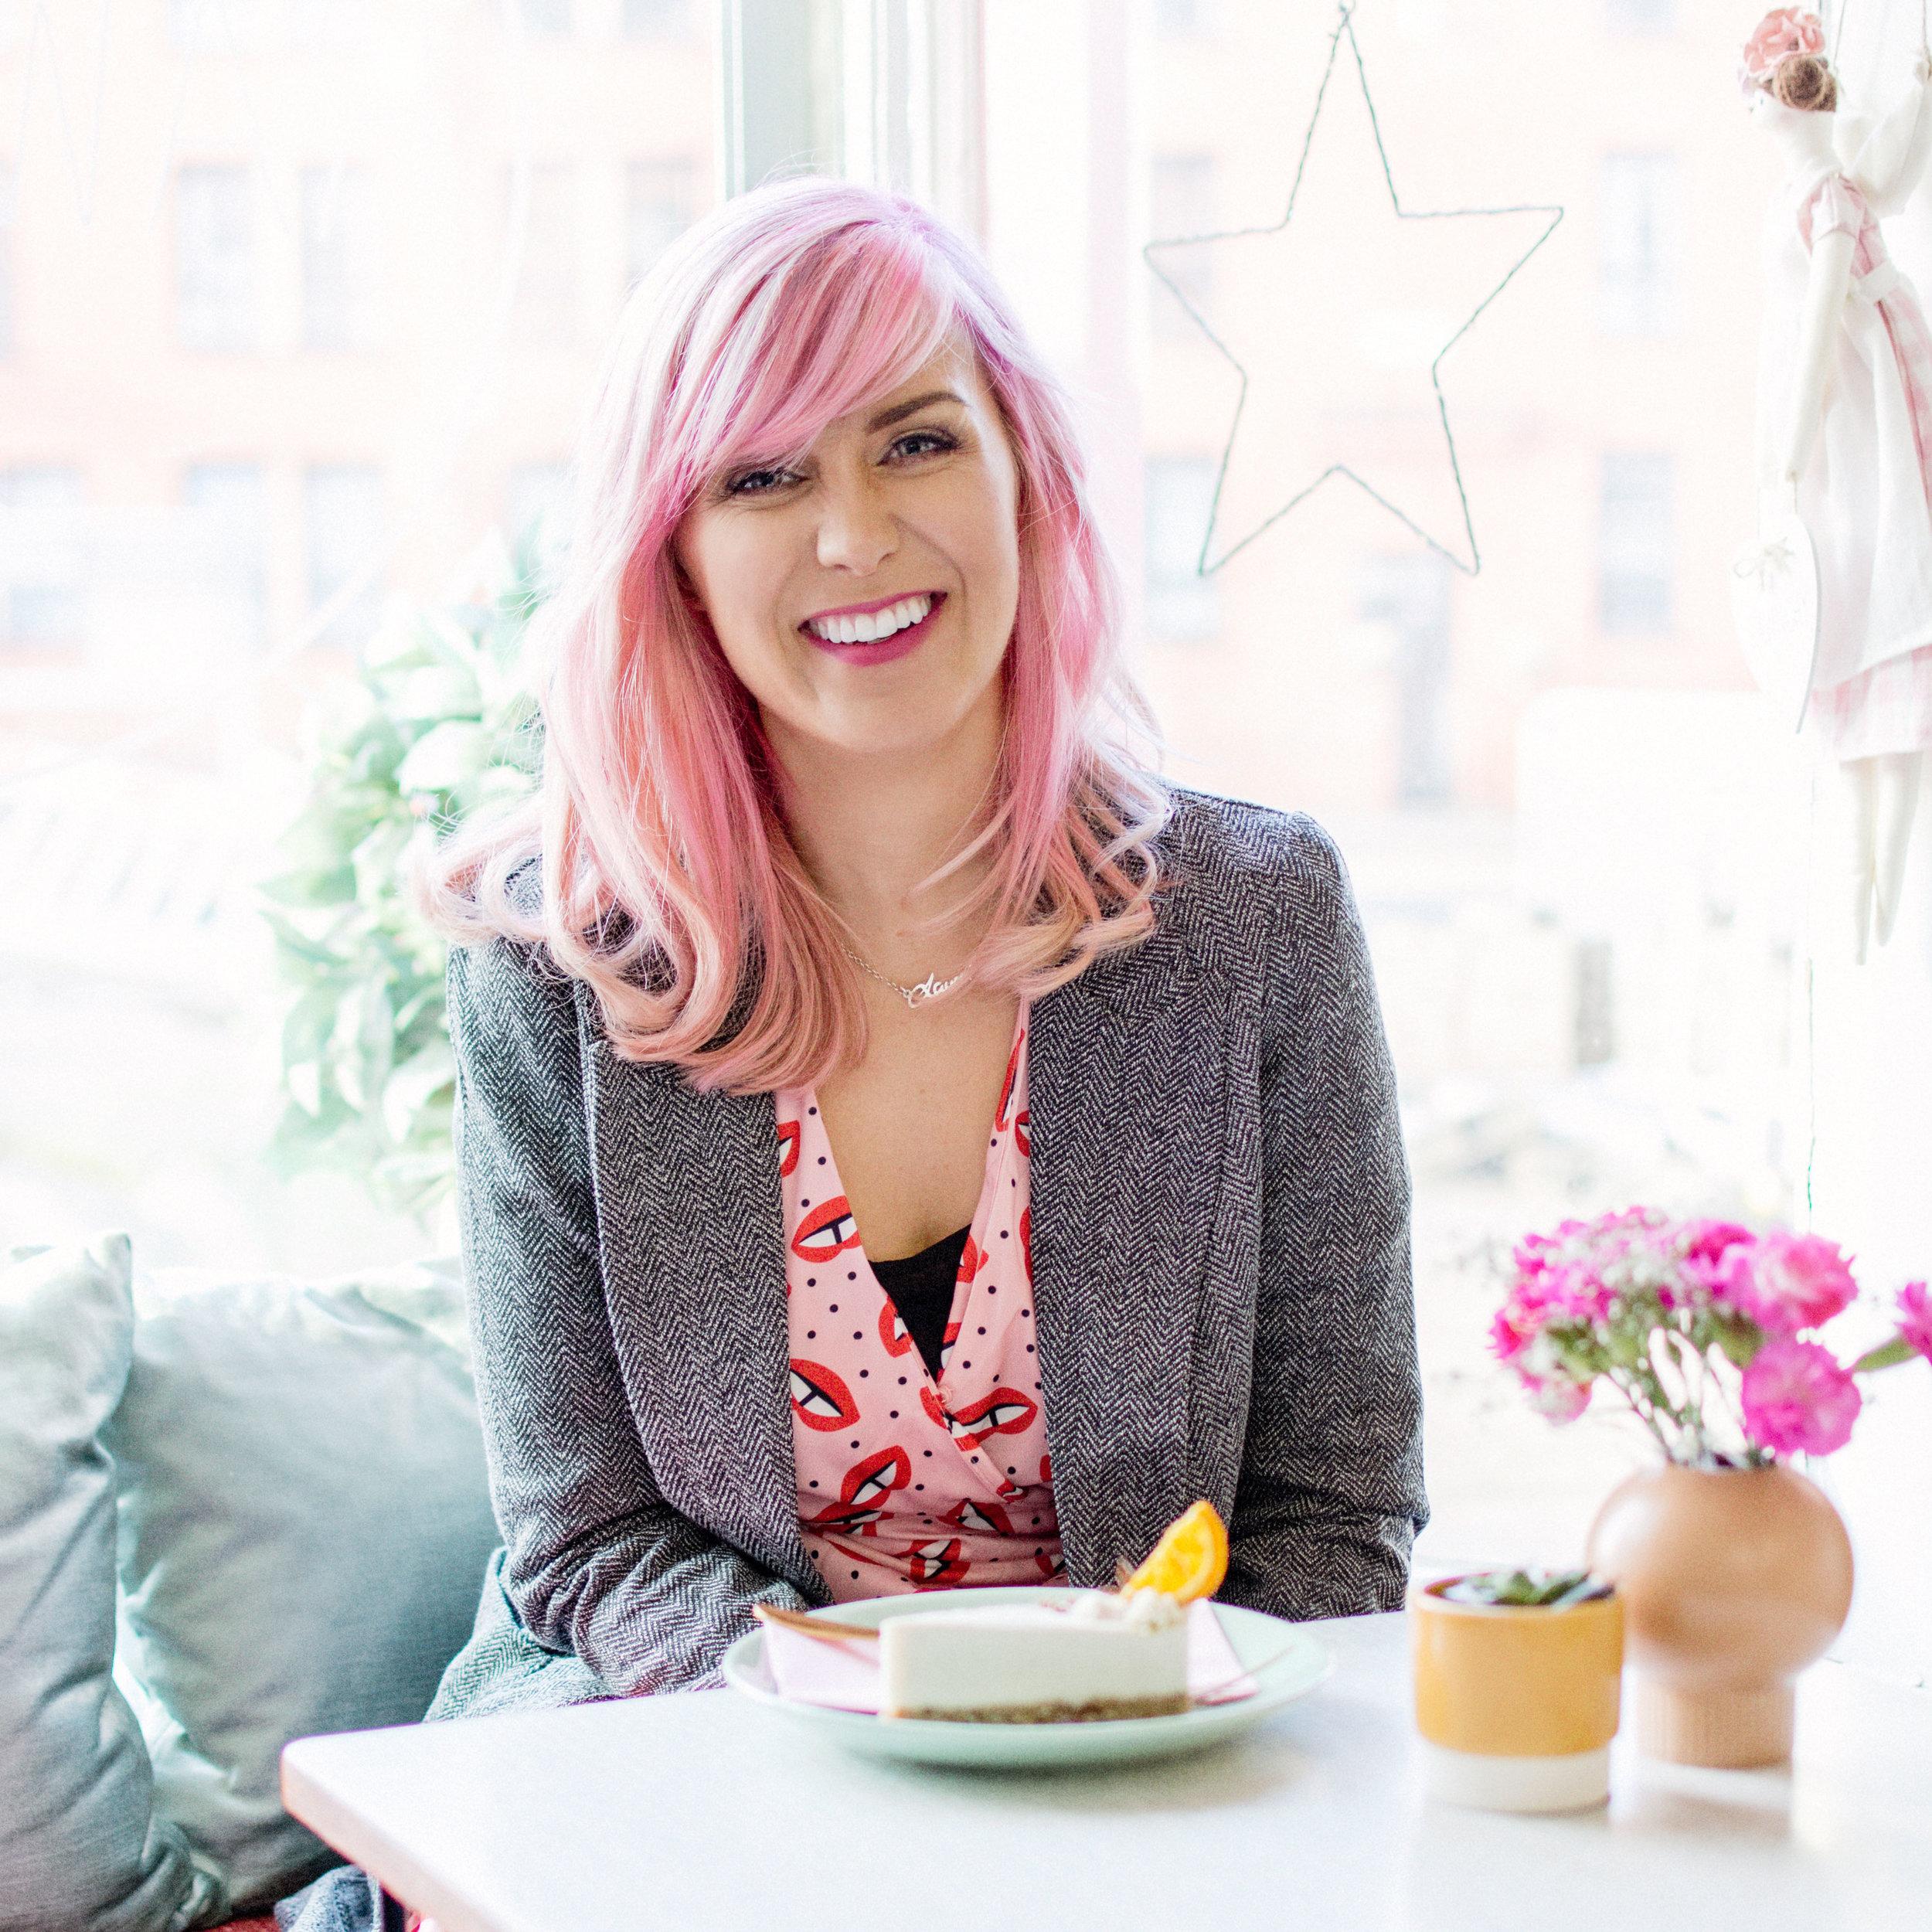 personal branding lifestyle photography charlotte kensington portraits